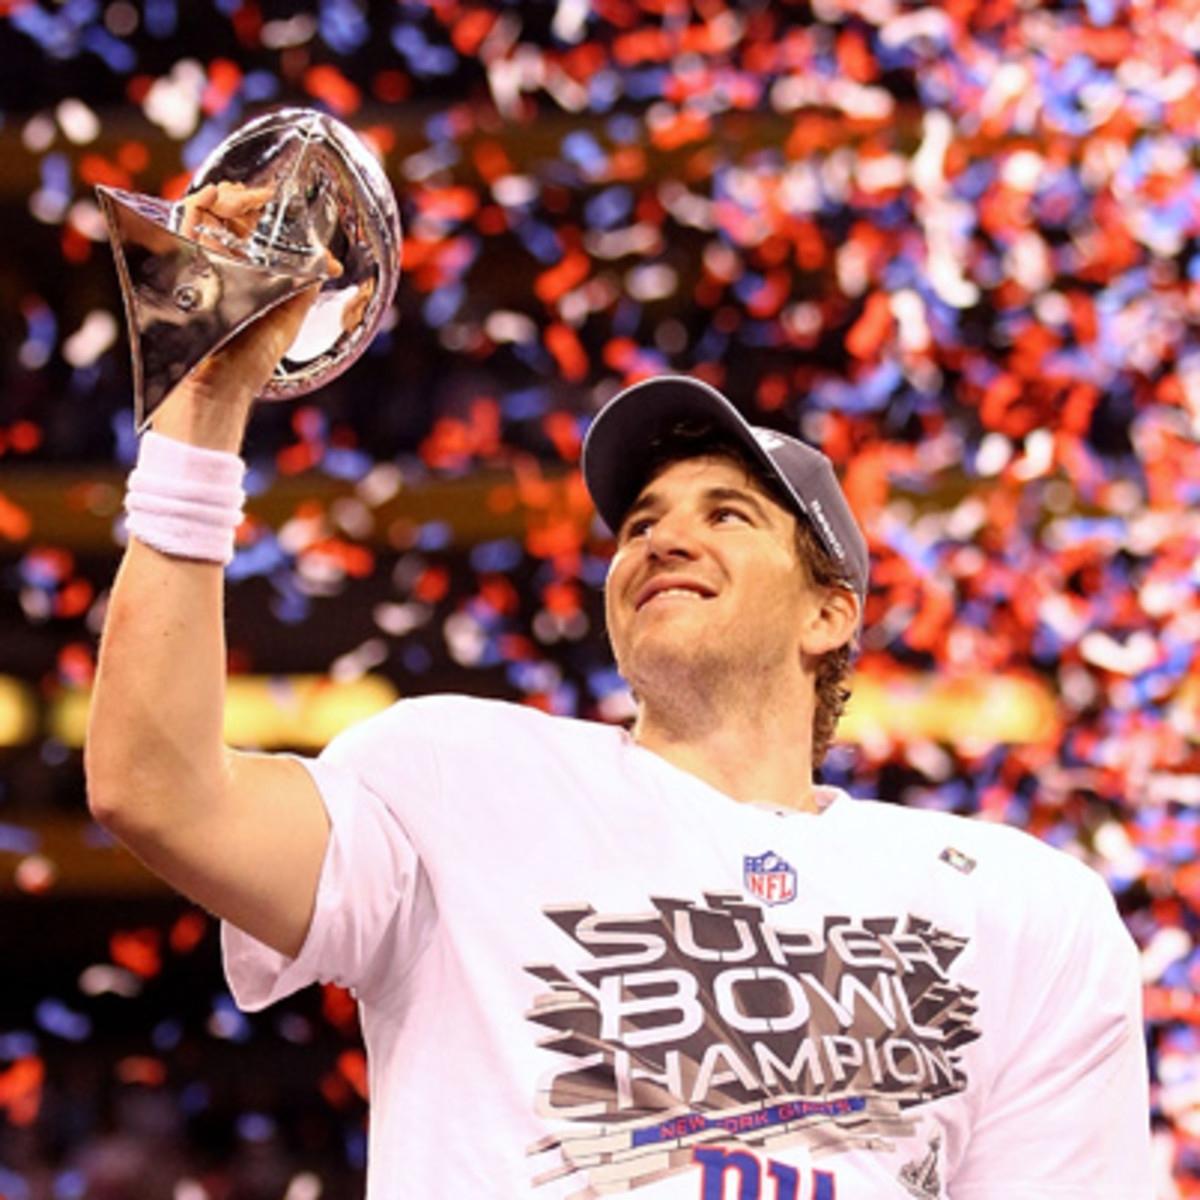 Eli Manning - Stats, Age & Wife - Biography regarding Eli Manning Super Bowl